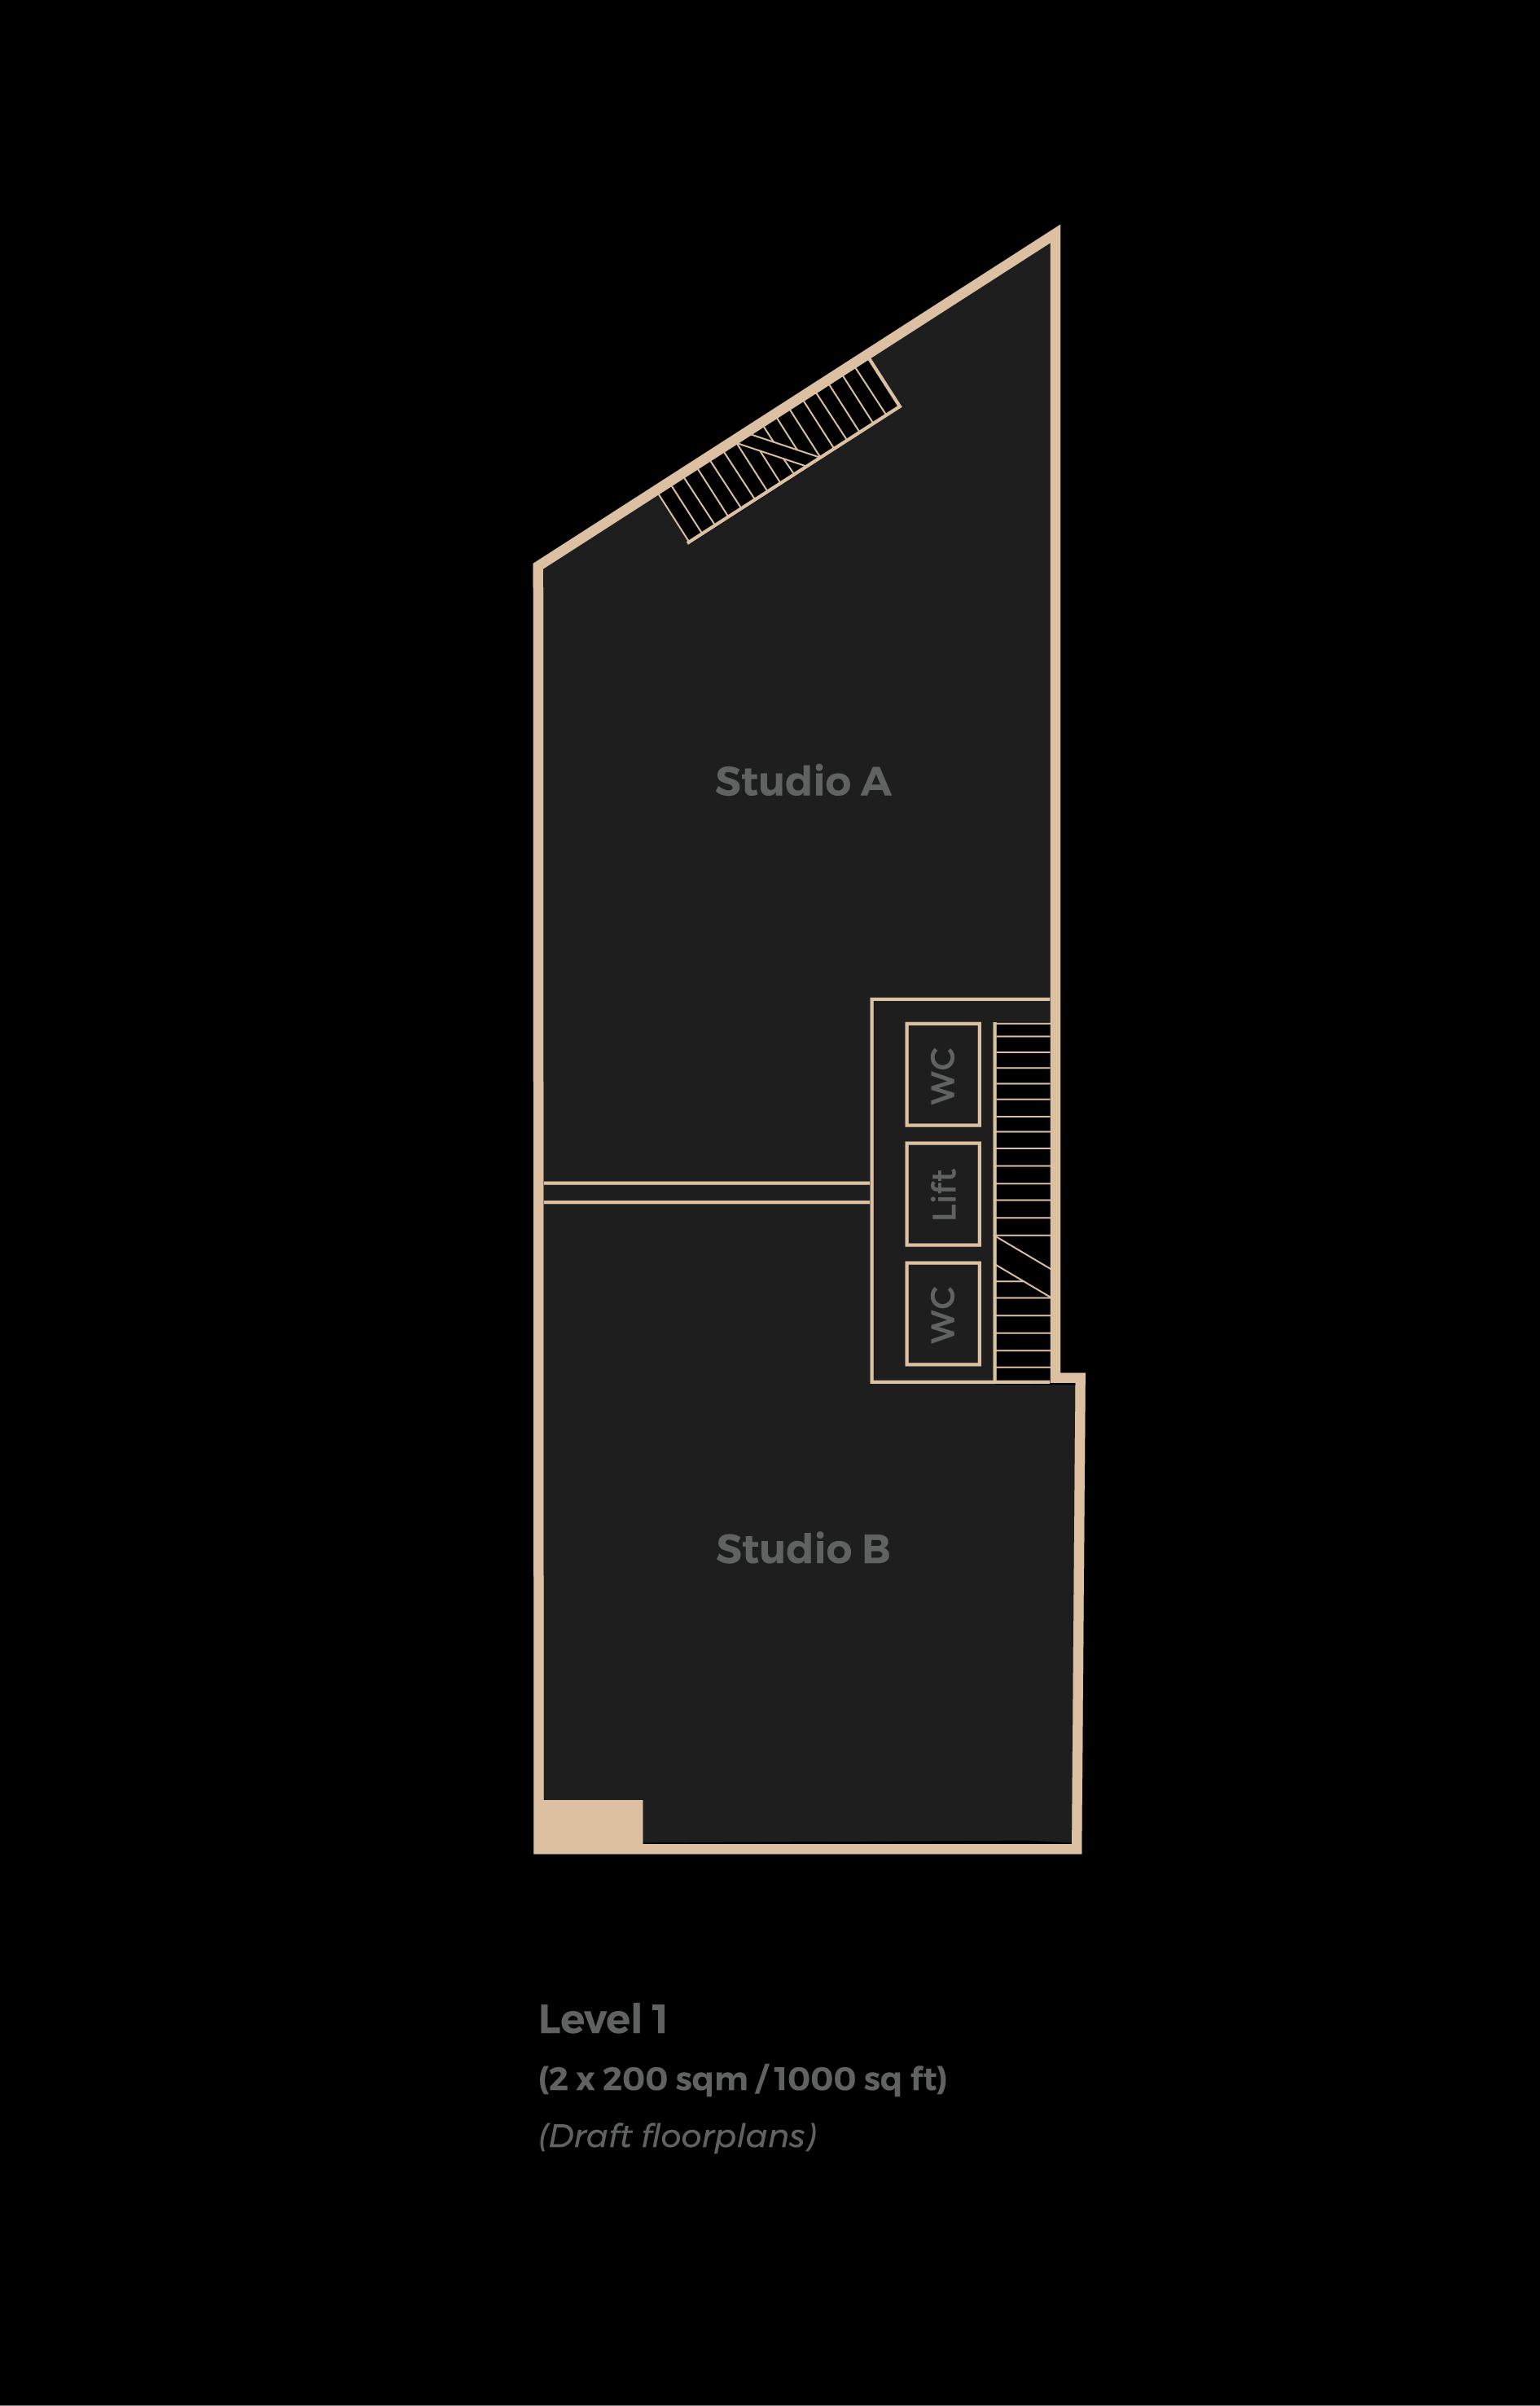 LTC001_Hat_House_Floorplans_black_outlined_V3-03.jpg